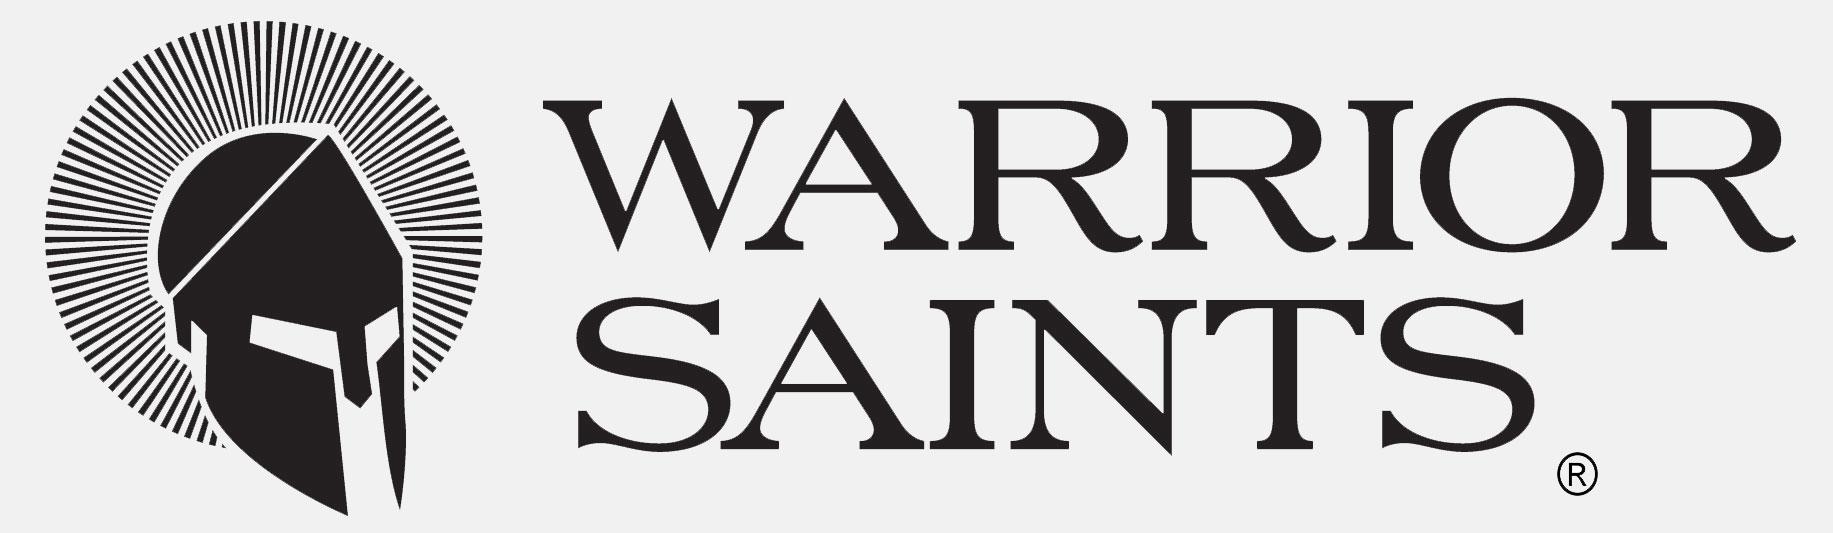 Warrior Saints